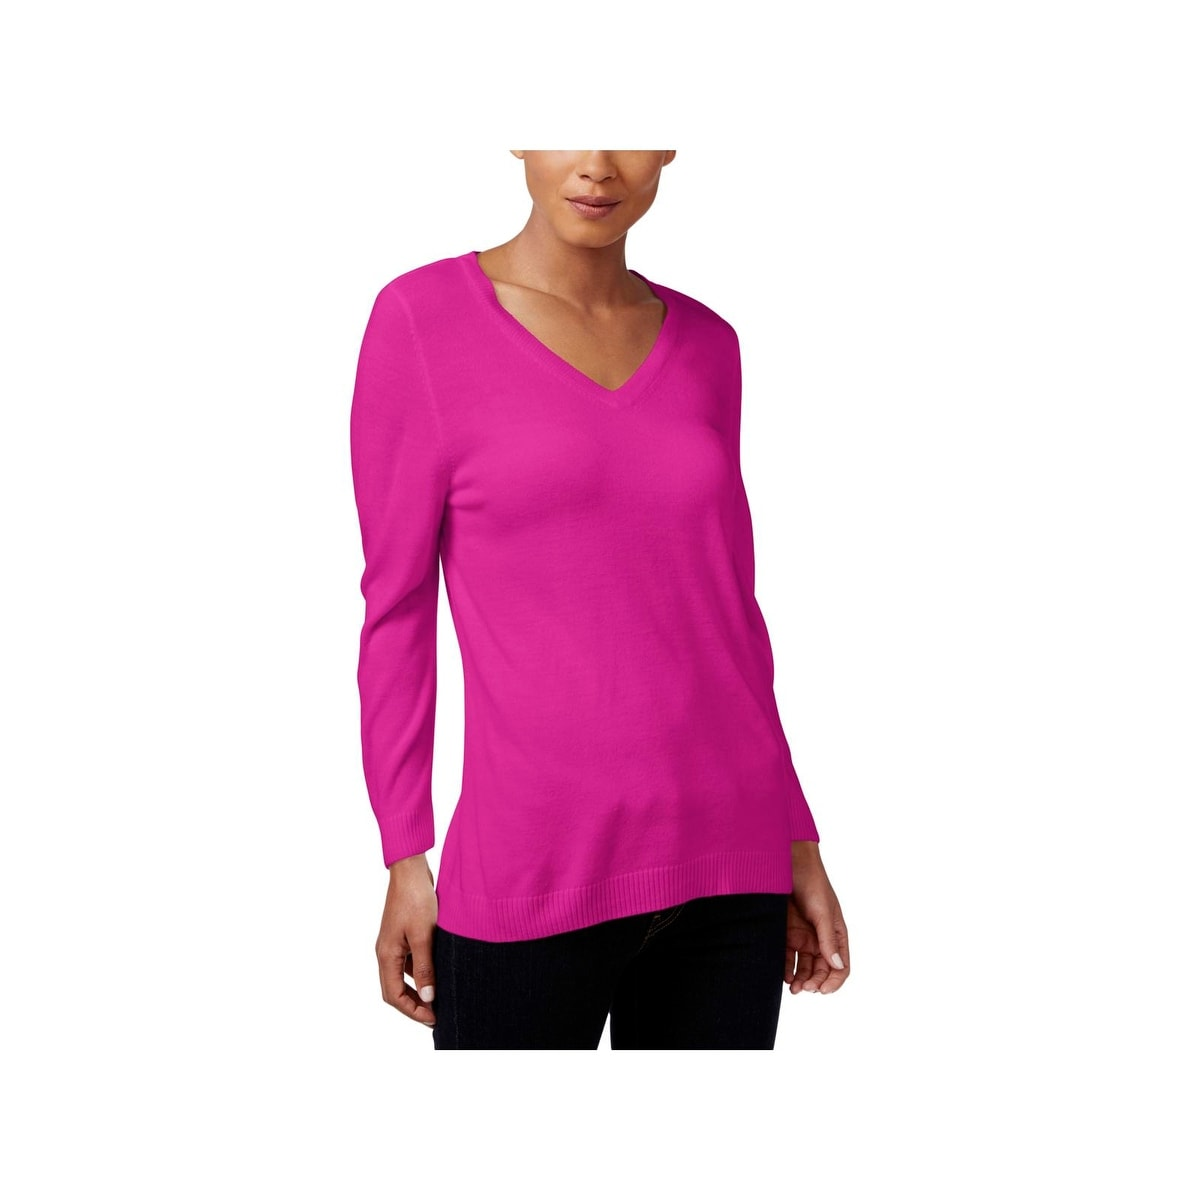 8e1837375c5 Karen Scott Women s Clothing